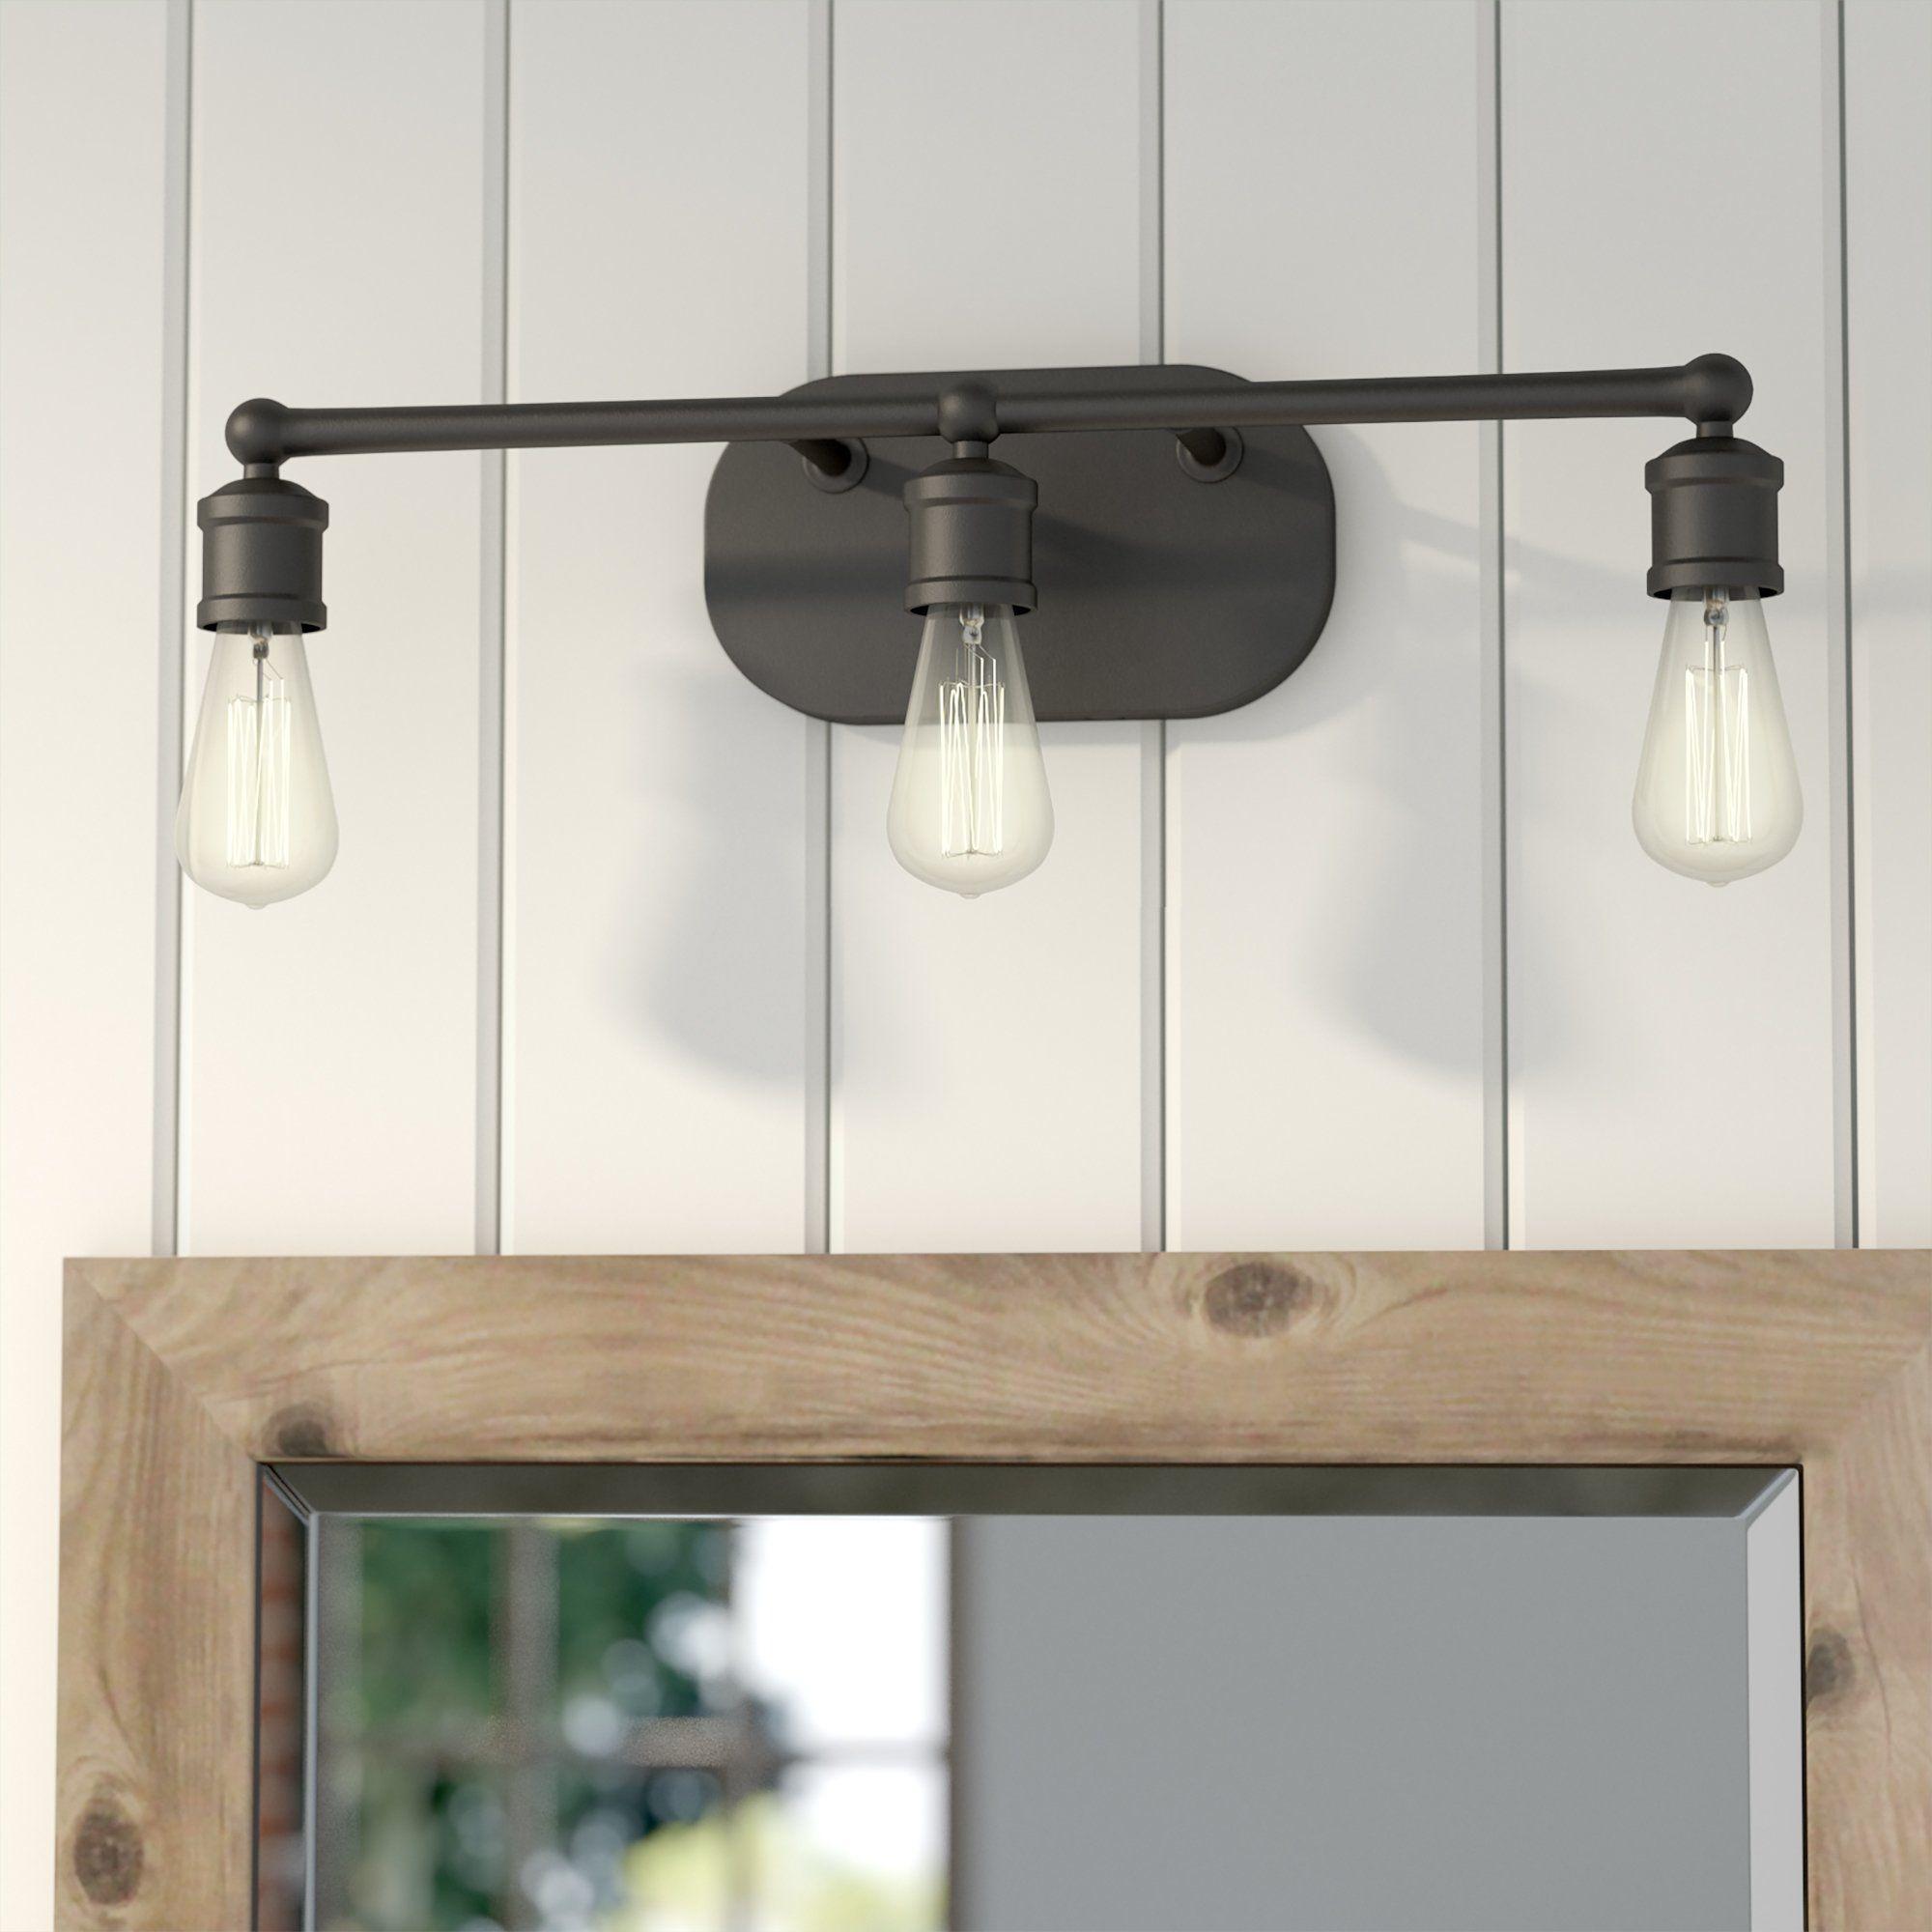 3light vanity light half bathroom farmhouse